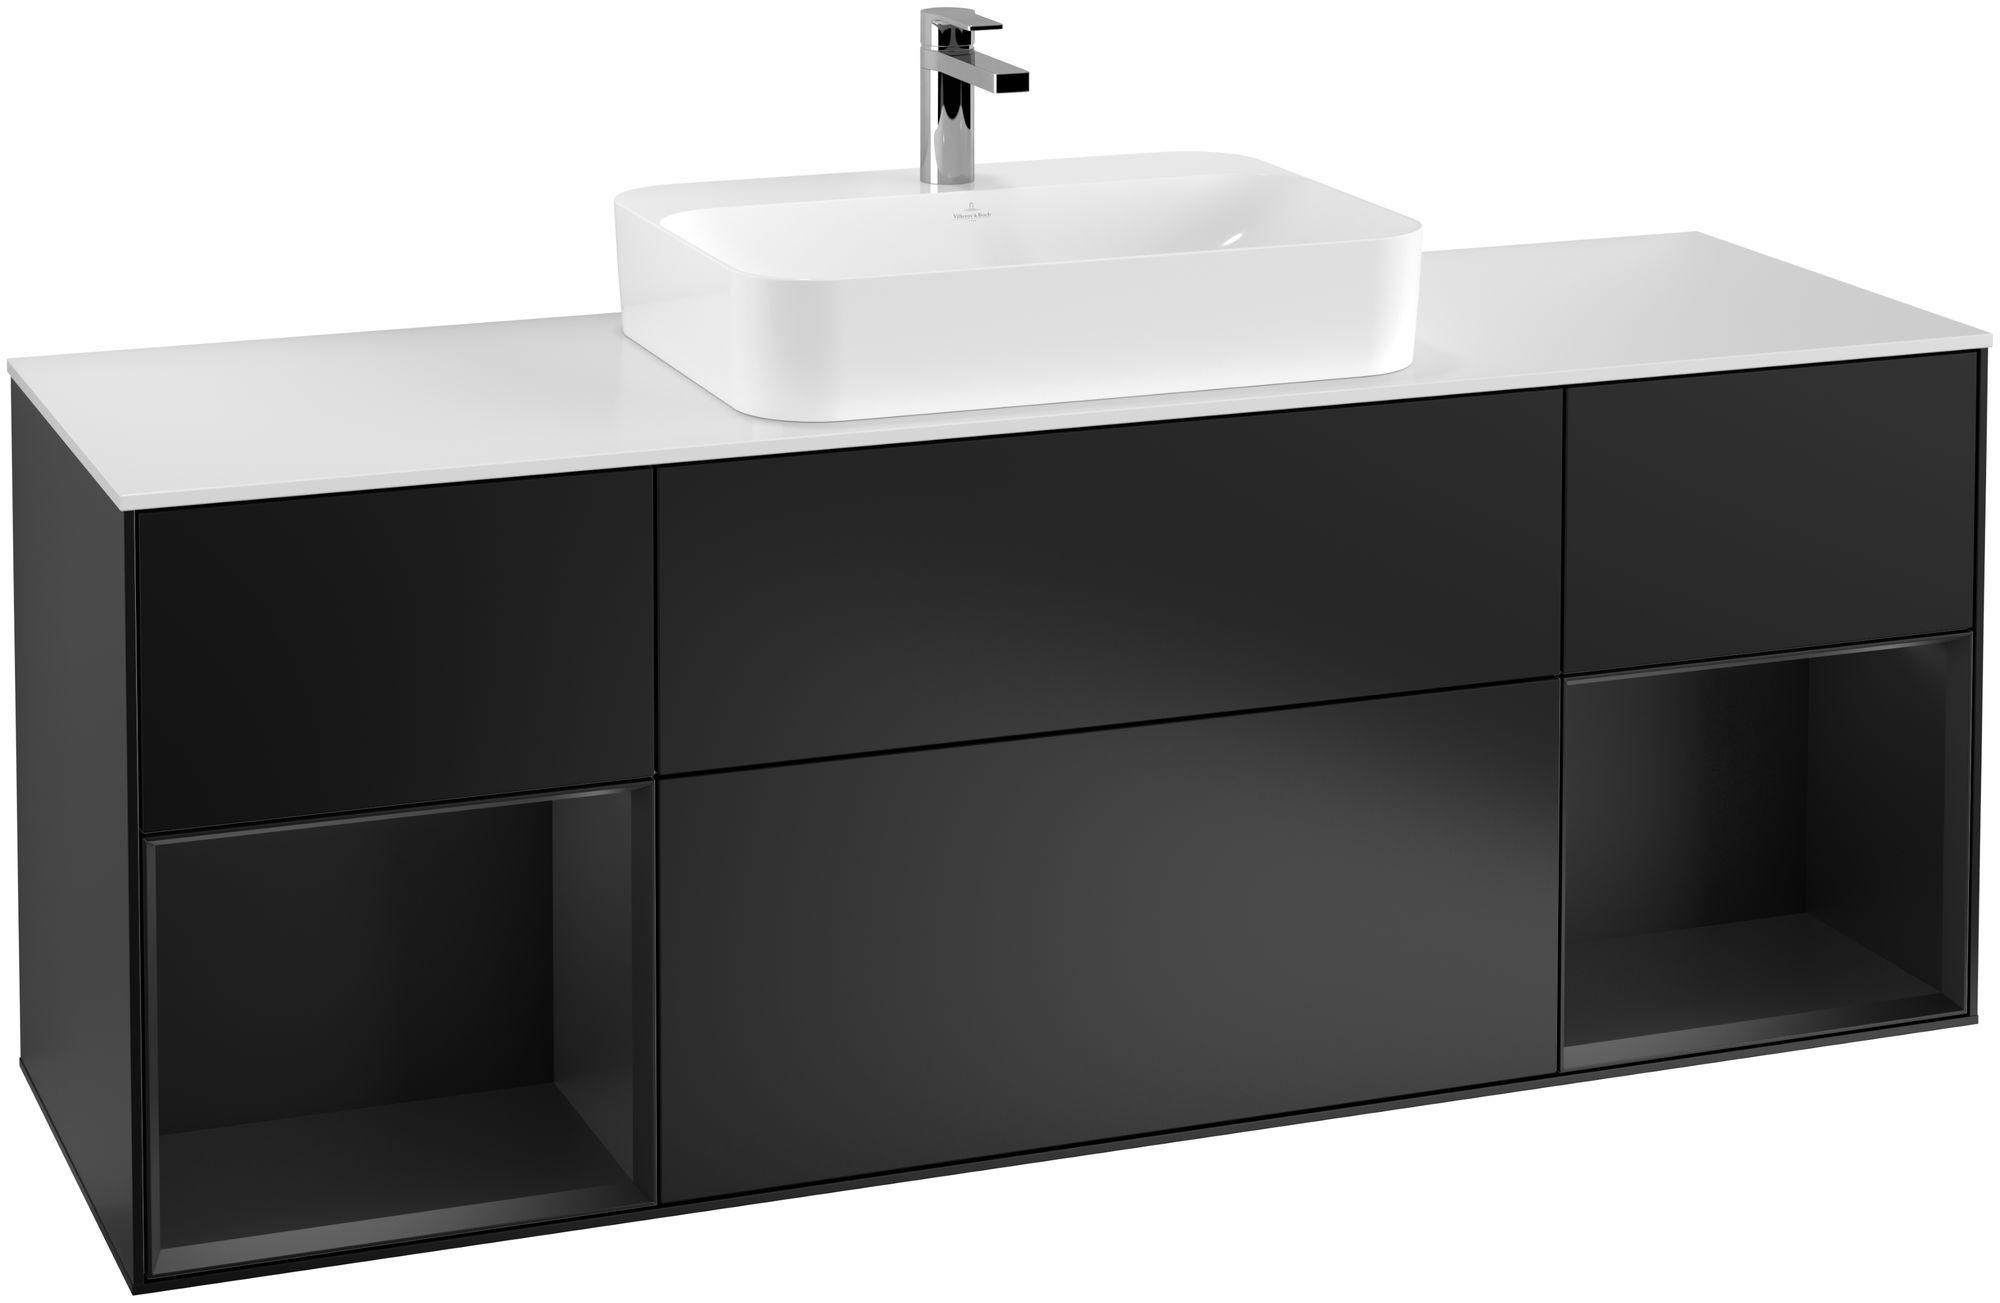 Villeroy & Boch Finion G45 Waschtischunterschrank mit Regalelement 4 Auszüge Waschtisch mittig LED-Beleuchtung B:160xH:60,3xT:50,1cm Front, Korpus: Black Matt Lacquer, Glasplatte: White Matt G451PDPD